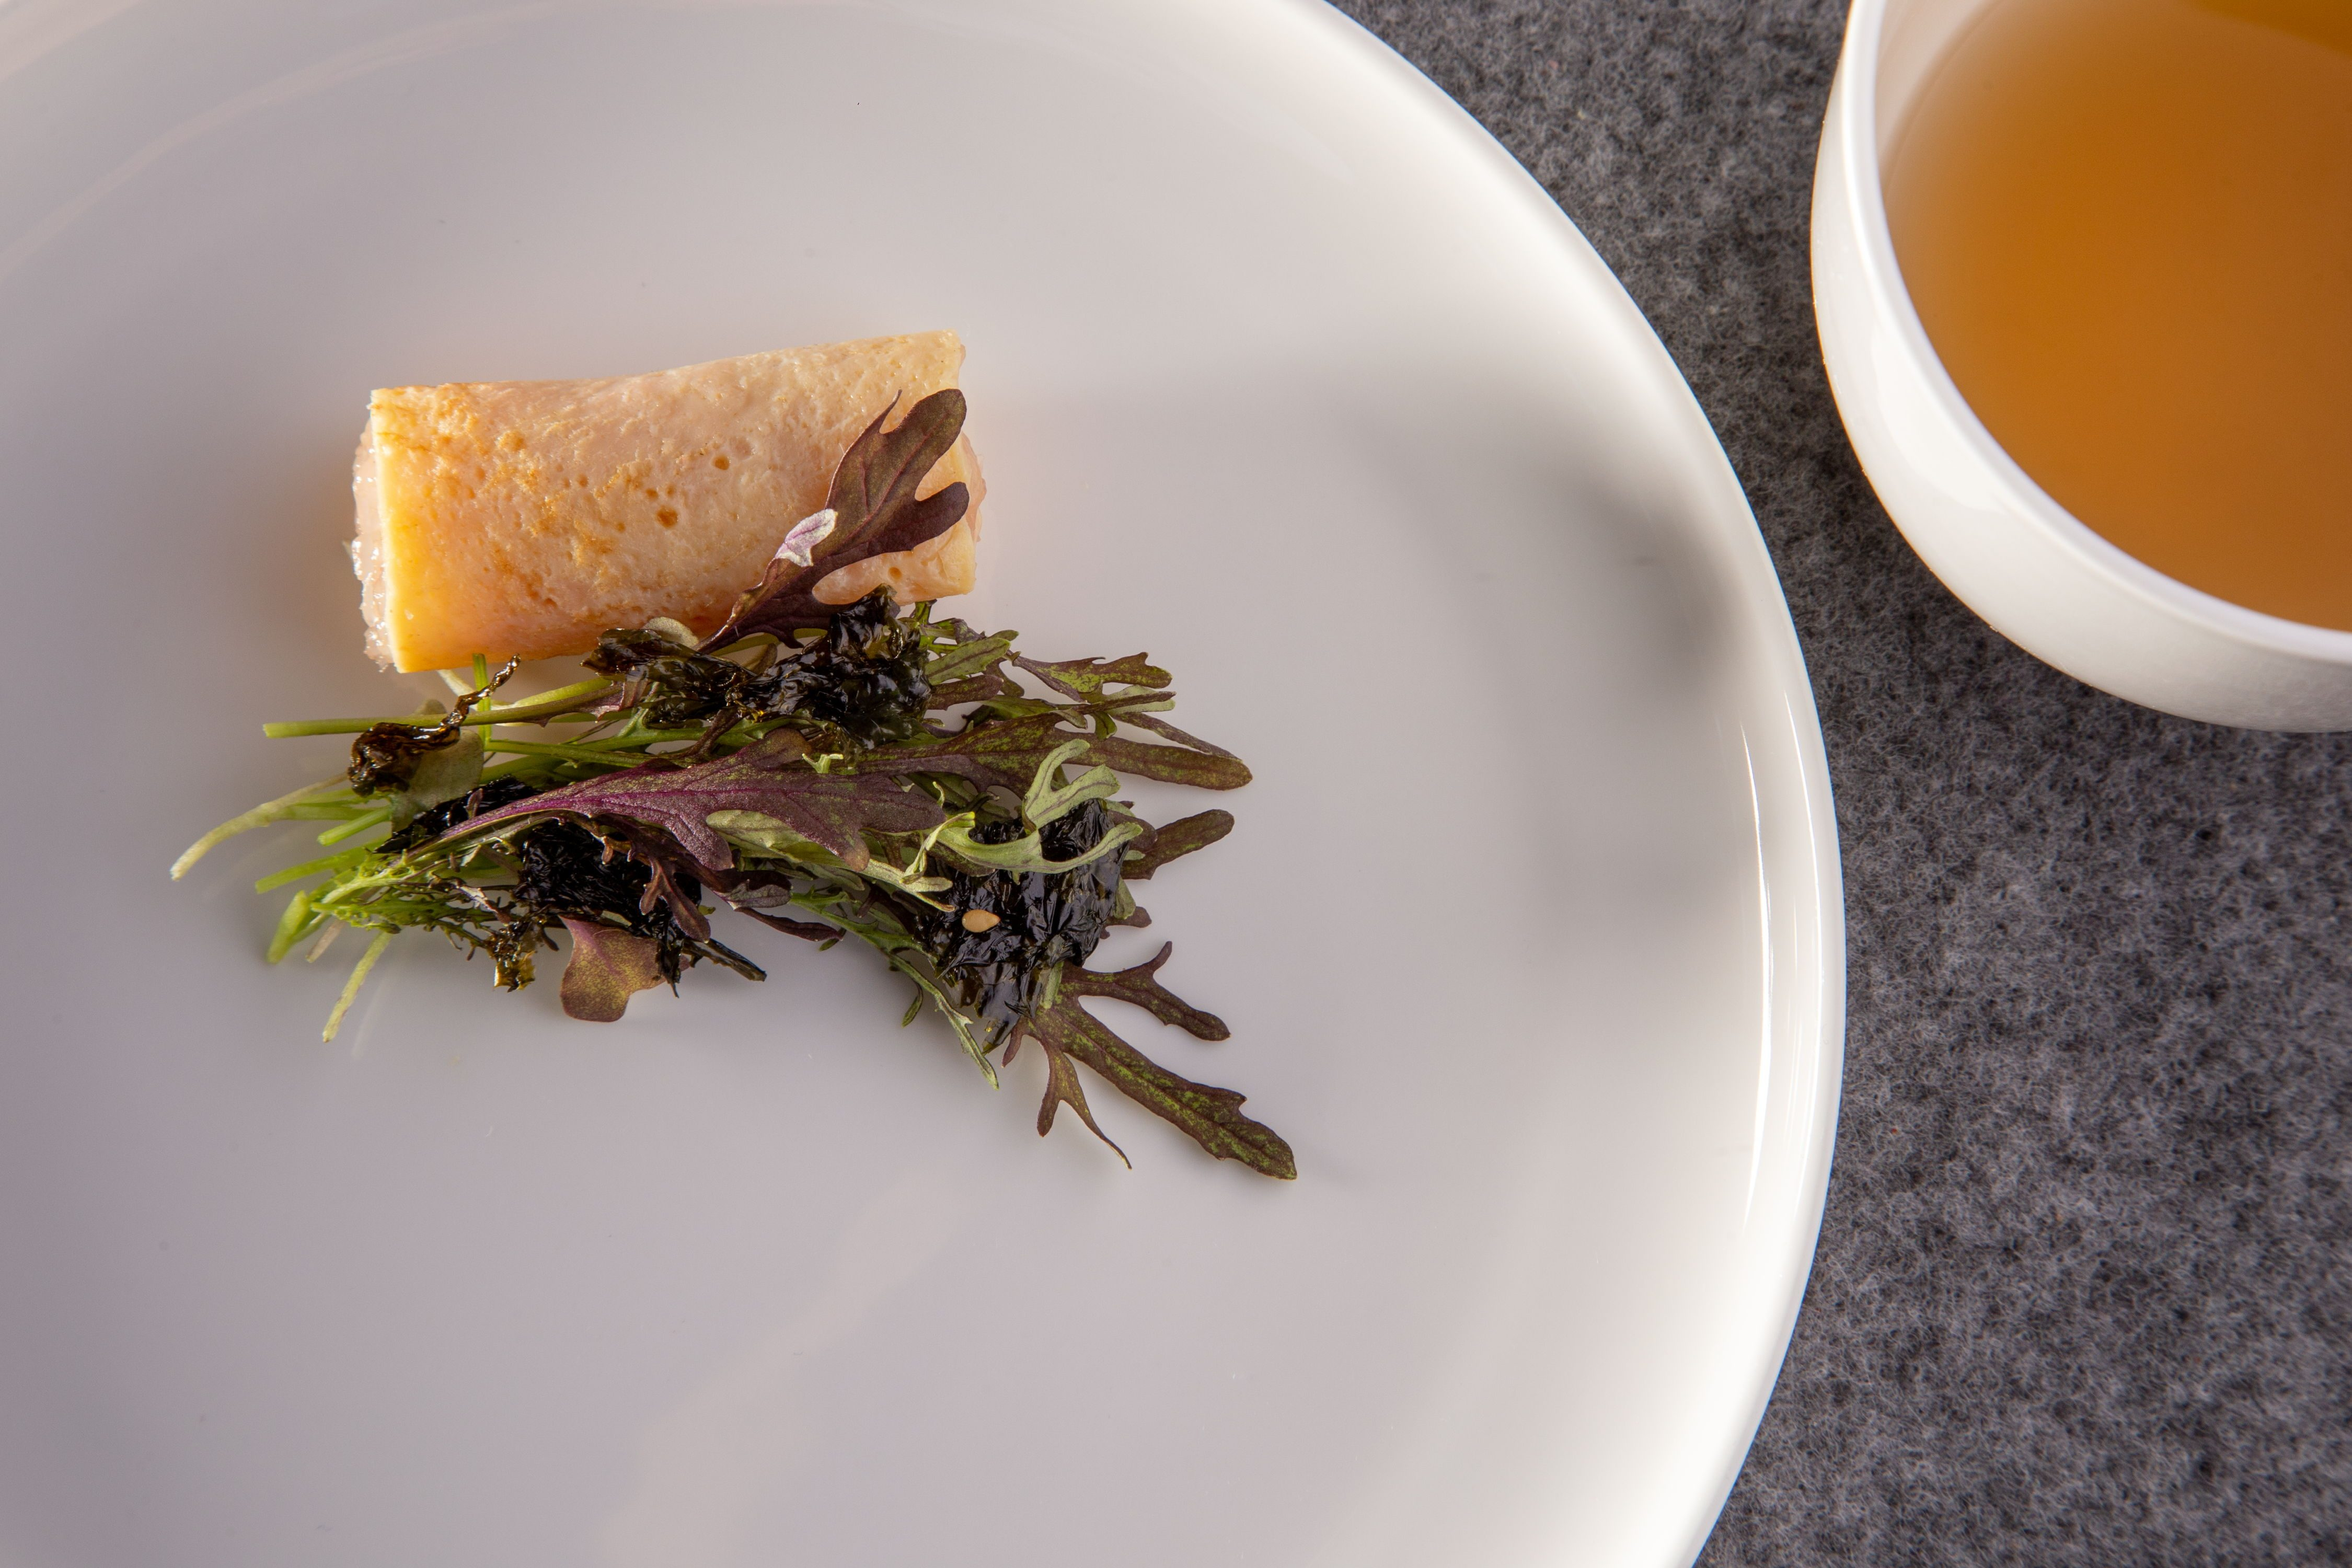 Ristoranti gourmet aperti per Natale 2019: mandarin bar e bistrot